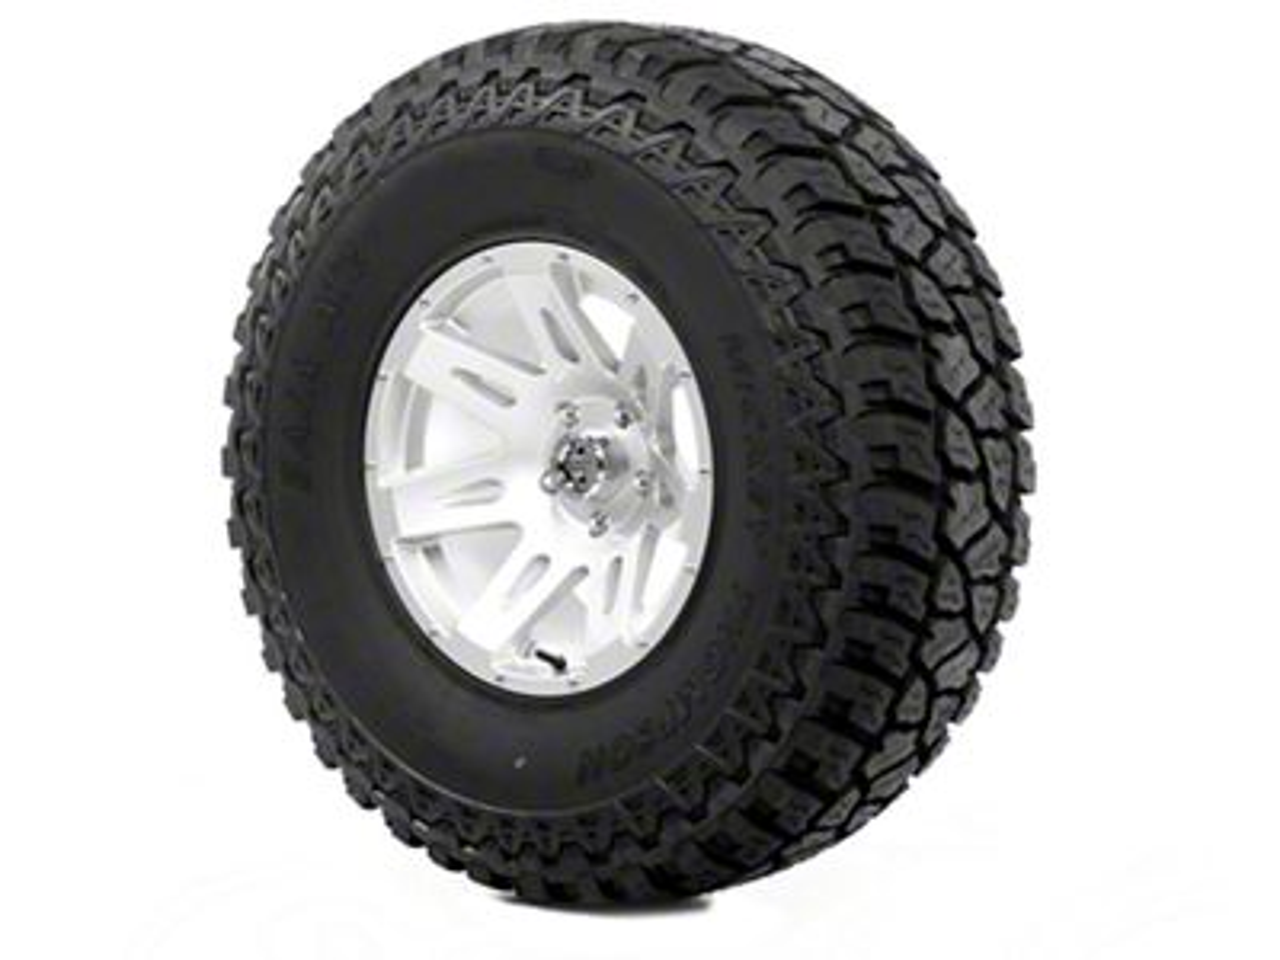 Rugged Ridge XHD Wheel 17x9 Silver and Mickey Thompson ATZ P3 37x12.50x17 Tire (13-18 Jeep Wrangler JK; 2018 Jeep Wrangler JL)